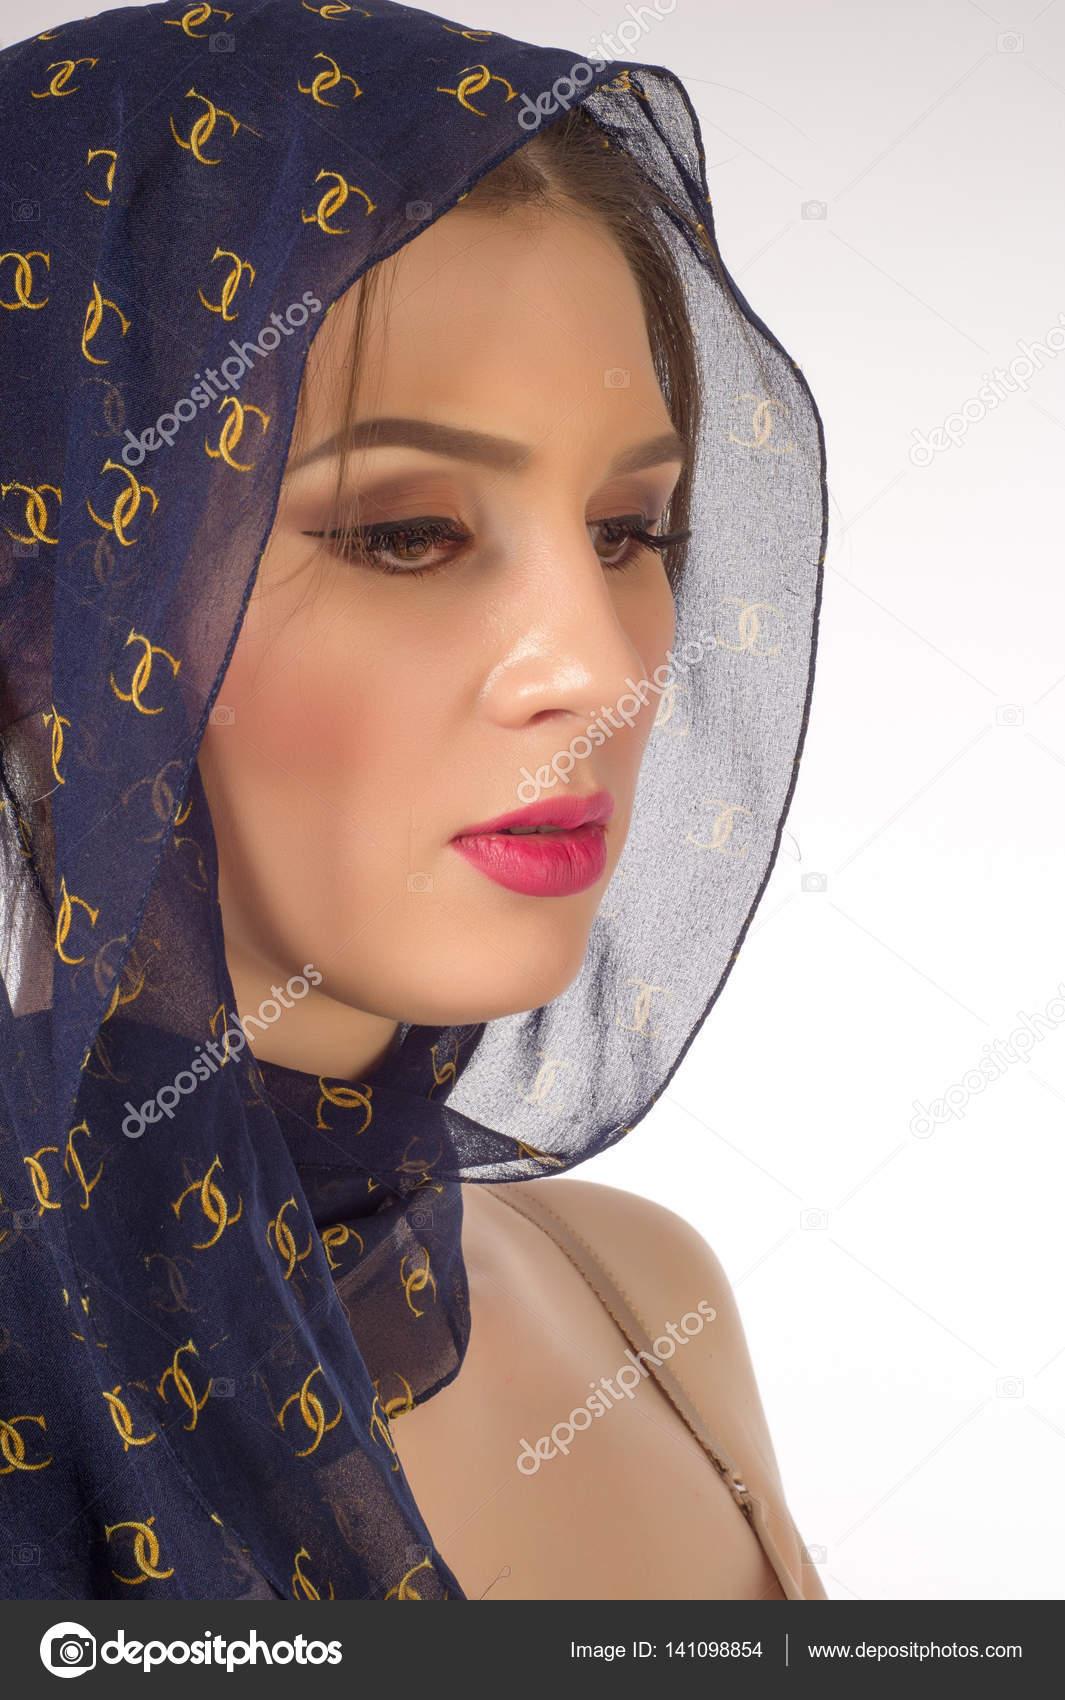 Muslim beautiful girl in the red dress and the hijab \u2014 Stock Photo